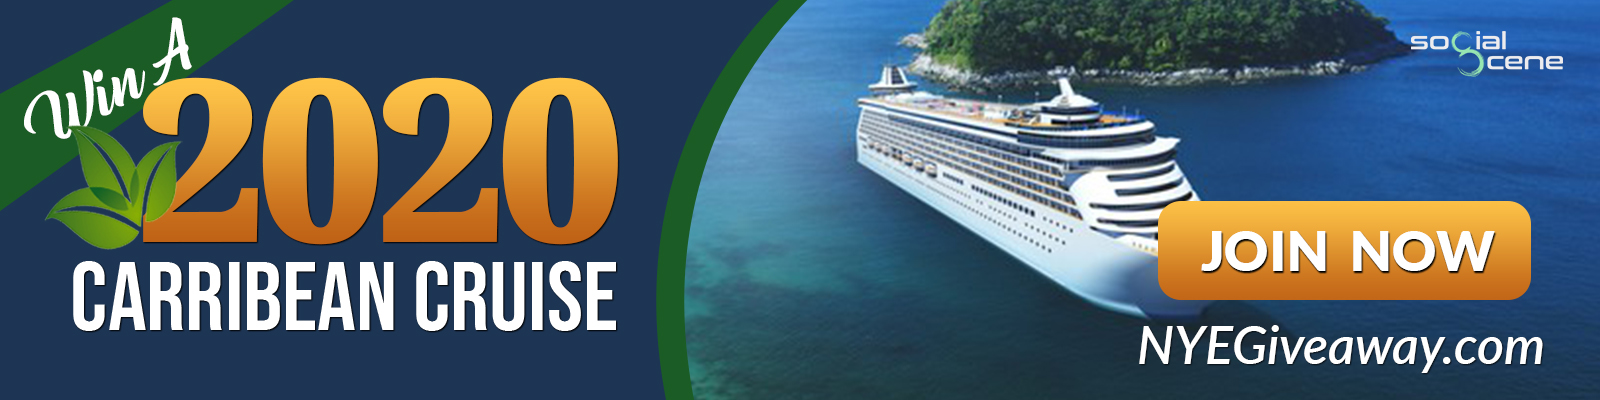 2020 Carribean Cruise